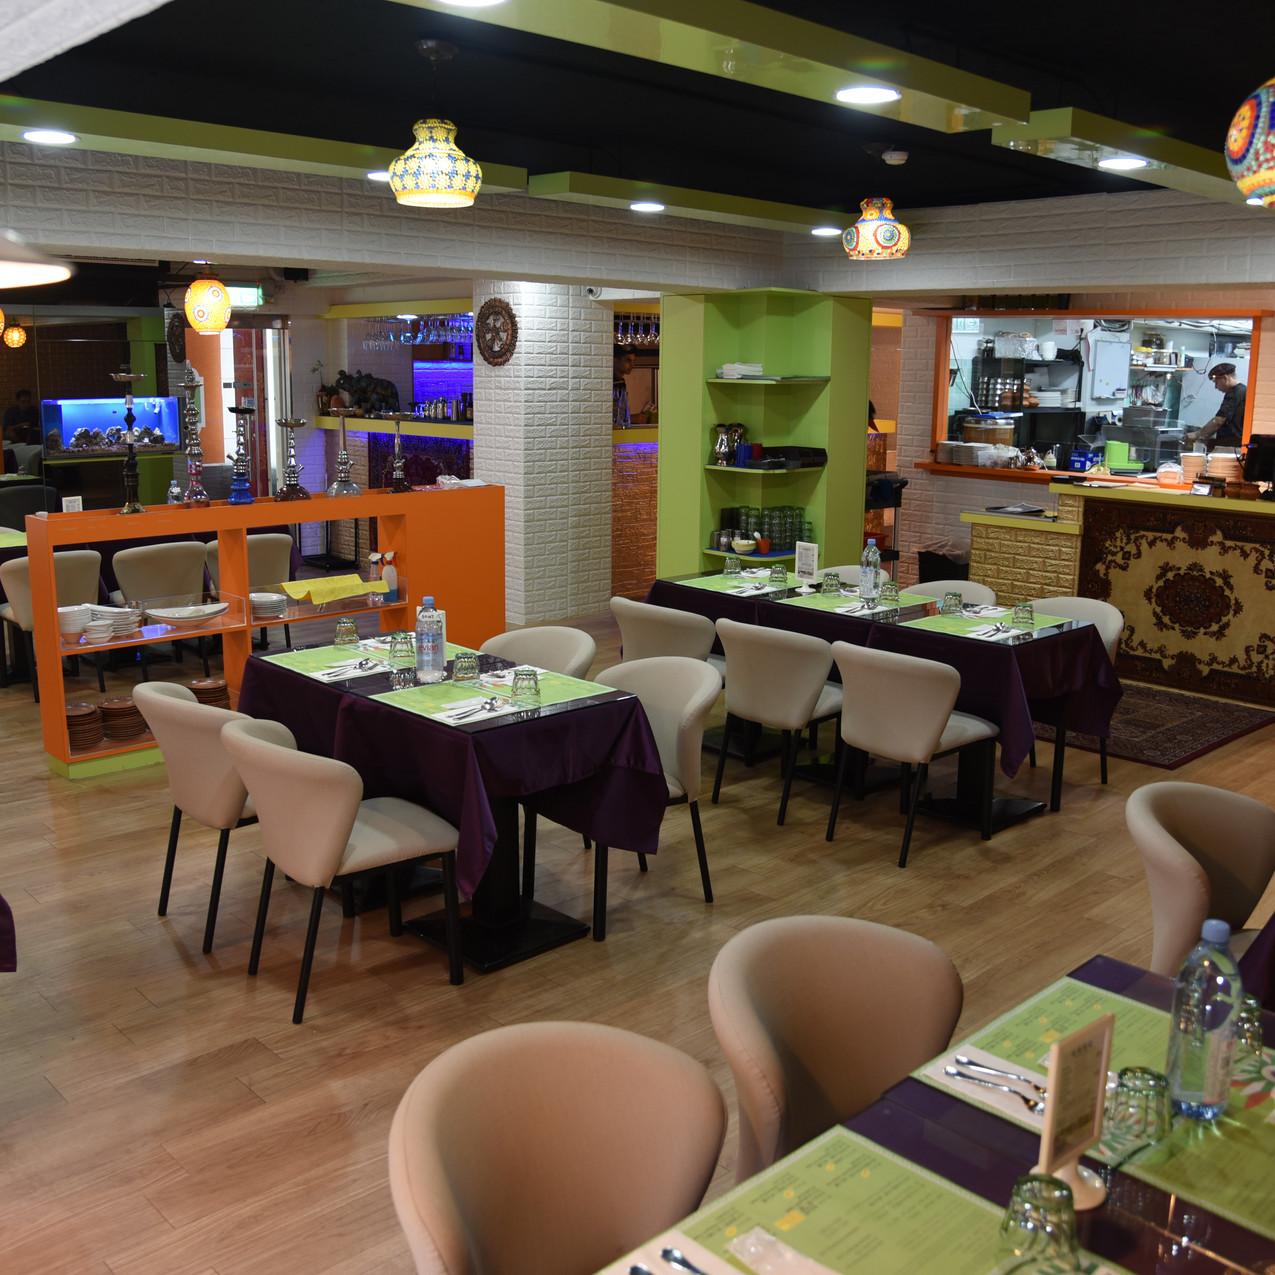 用餐環境Environment